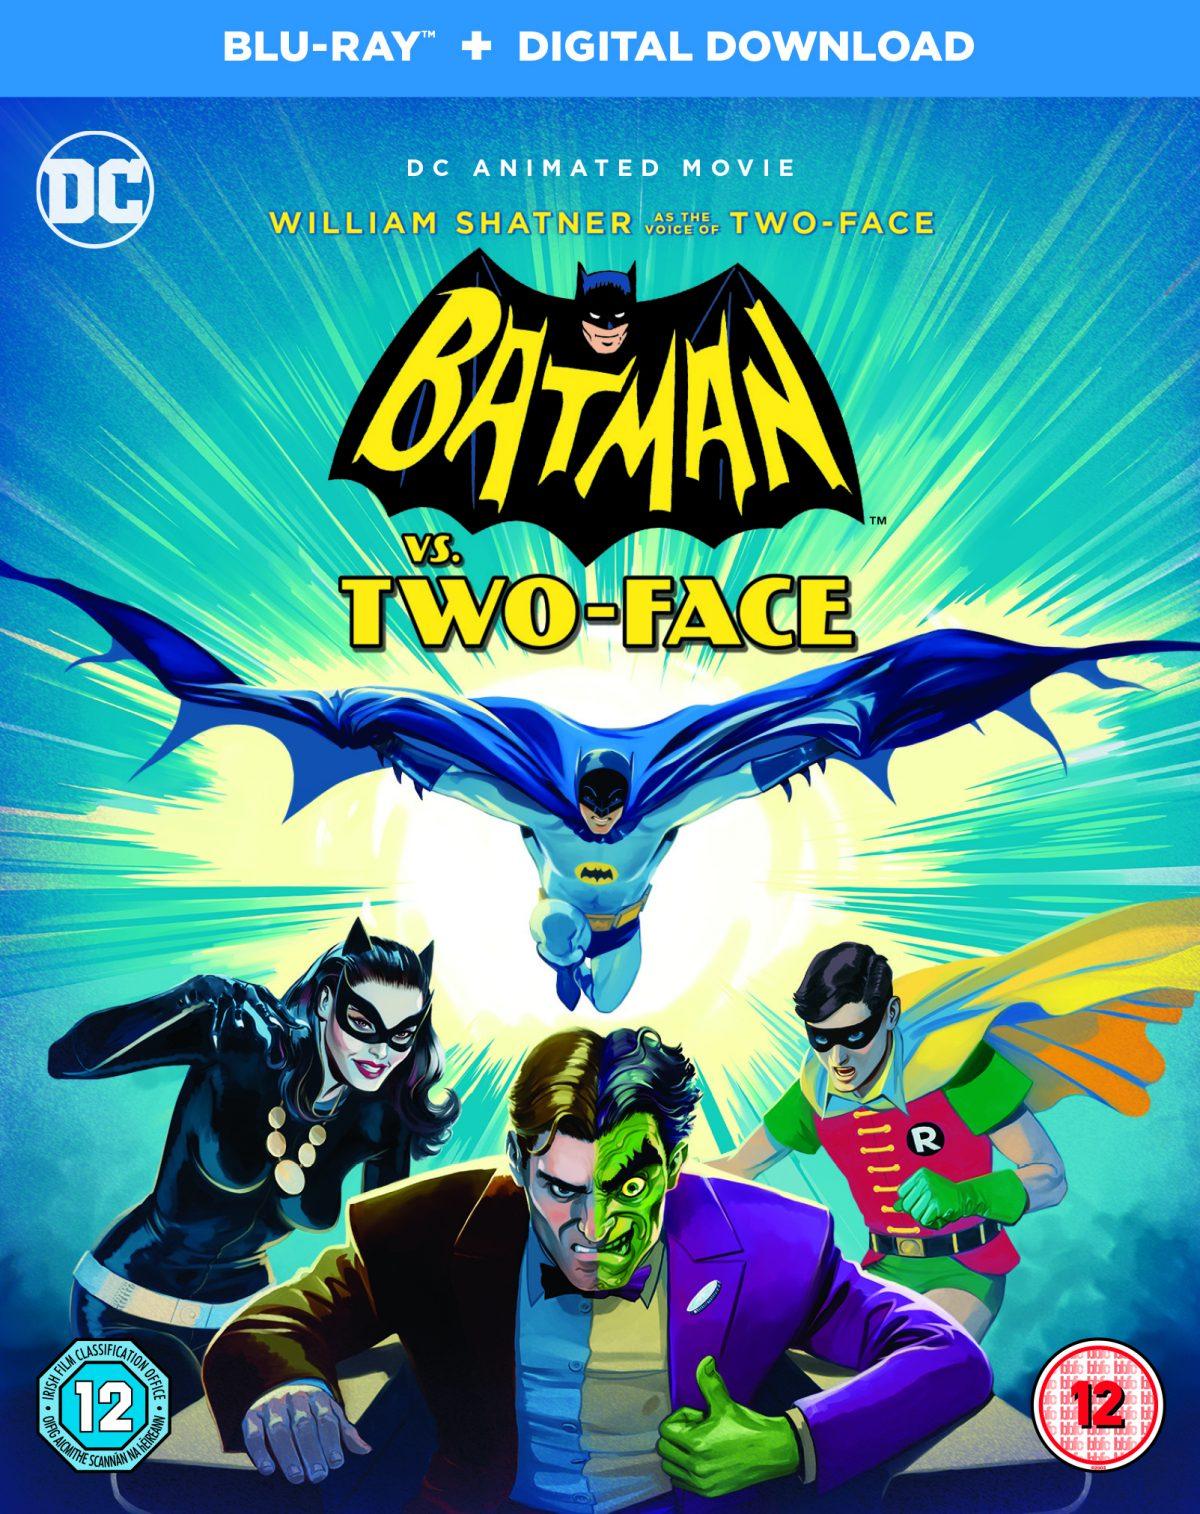 Batman vs. Two-Face Holy 60s Flashback Batman! Blu-ray Review